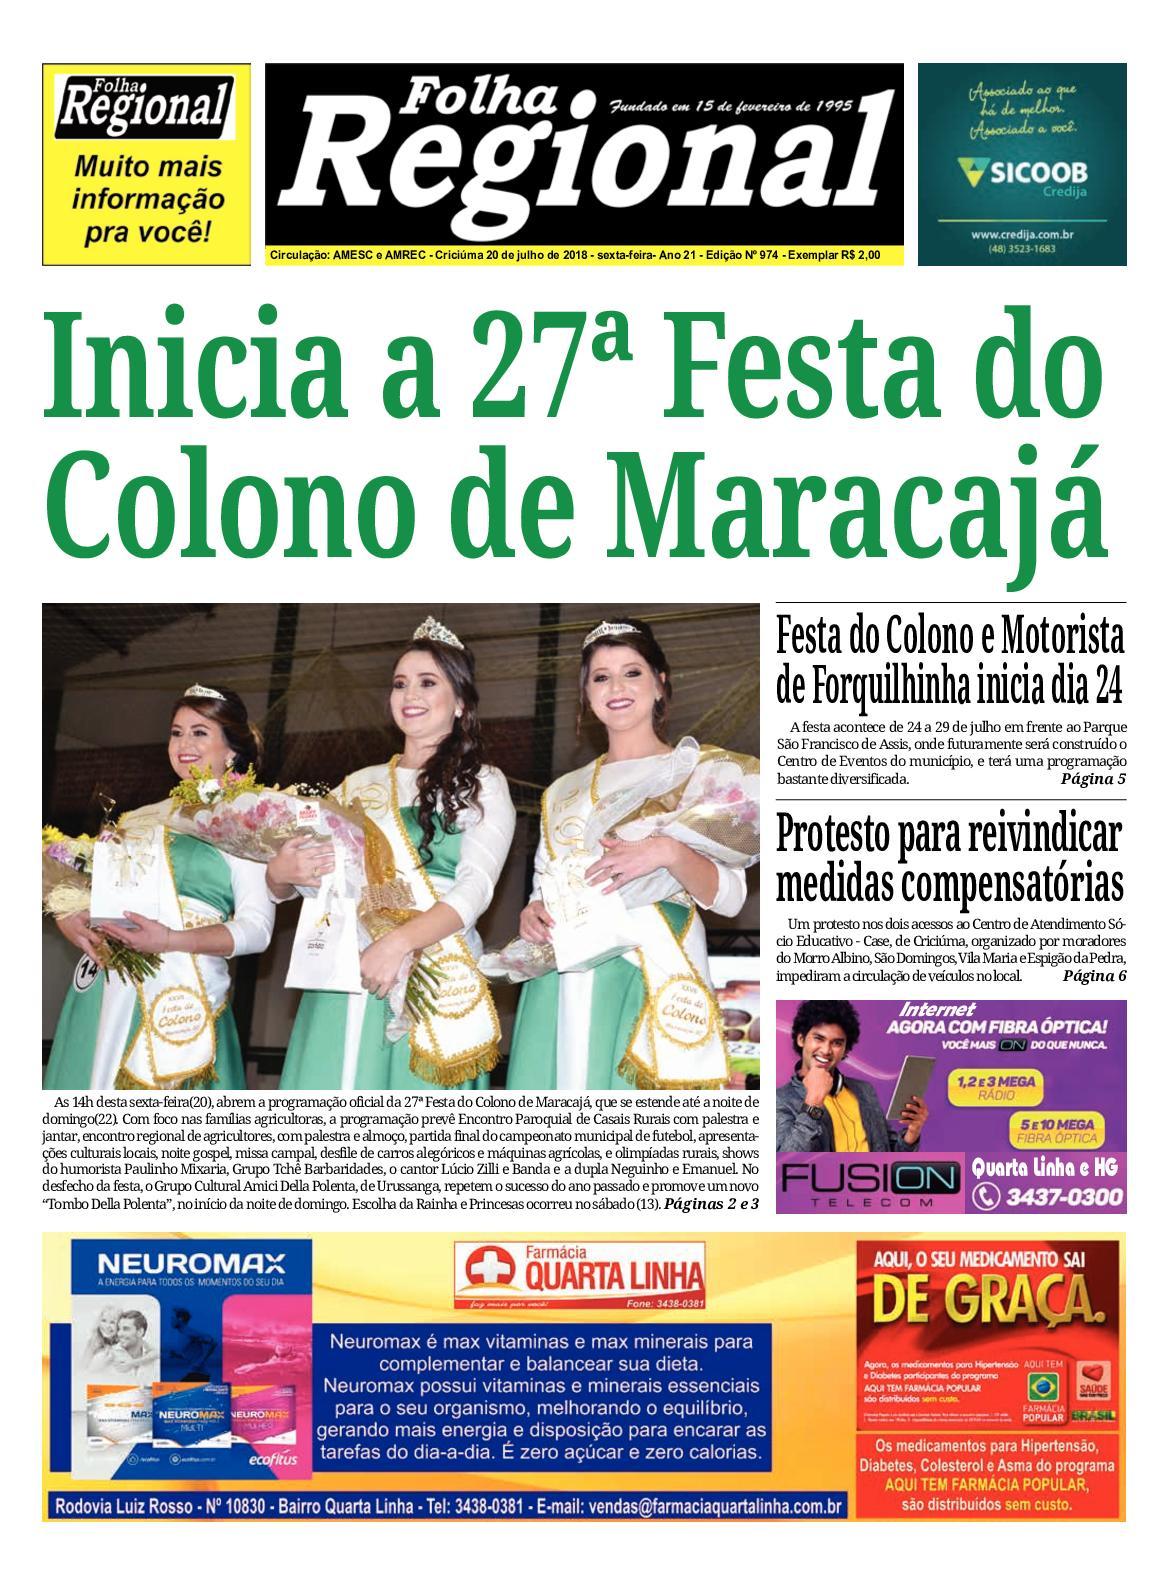 Folha Regional Ed.974 - 20 07 2018 - CALAMEO Downloader ee662e659b